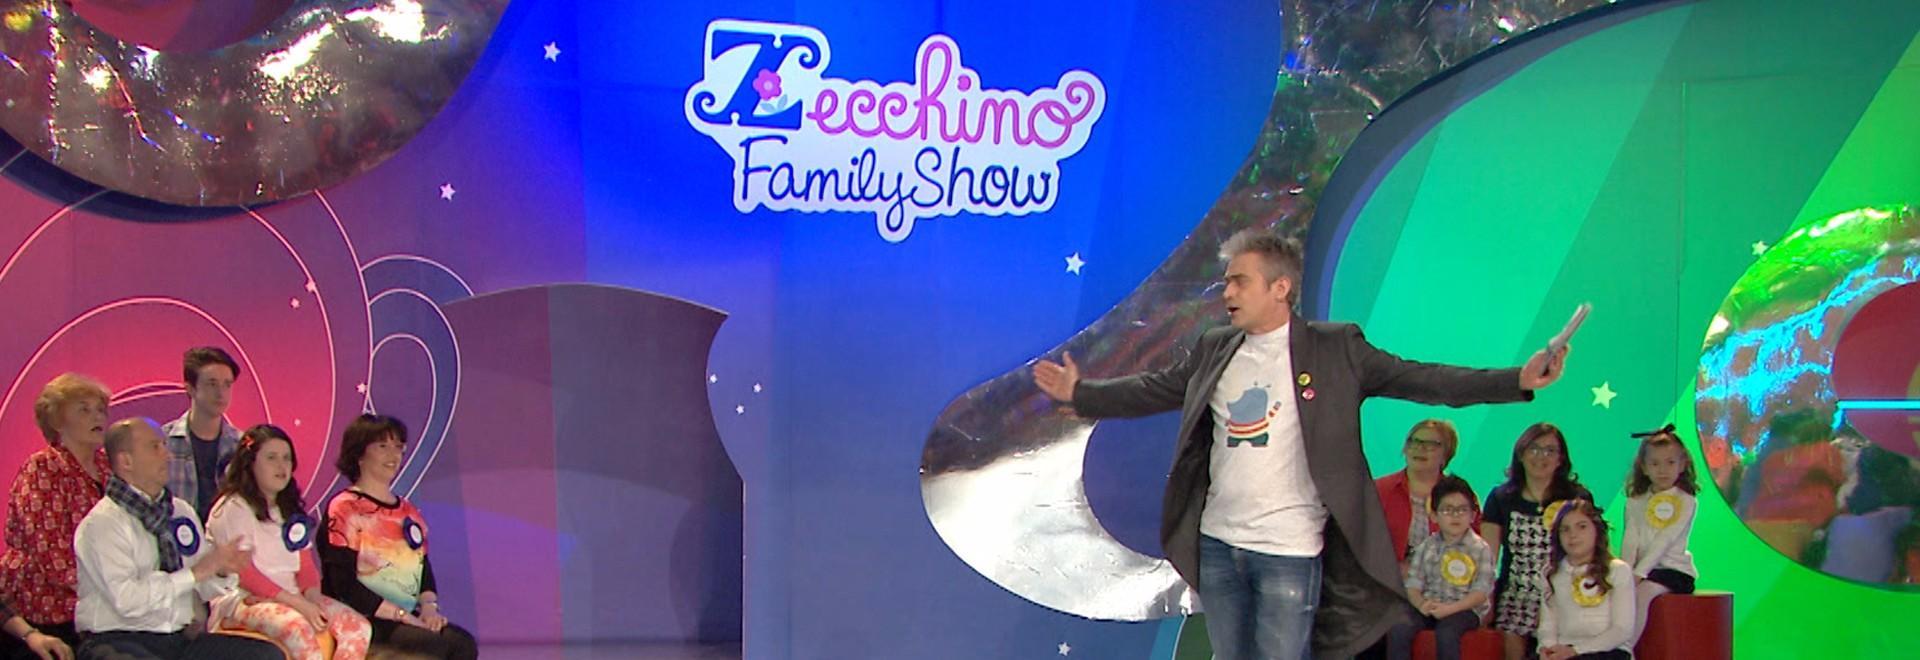 Zecchino Family Show